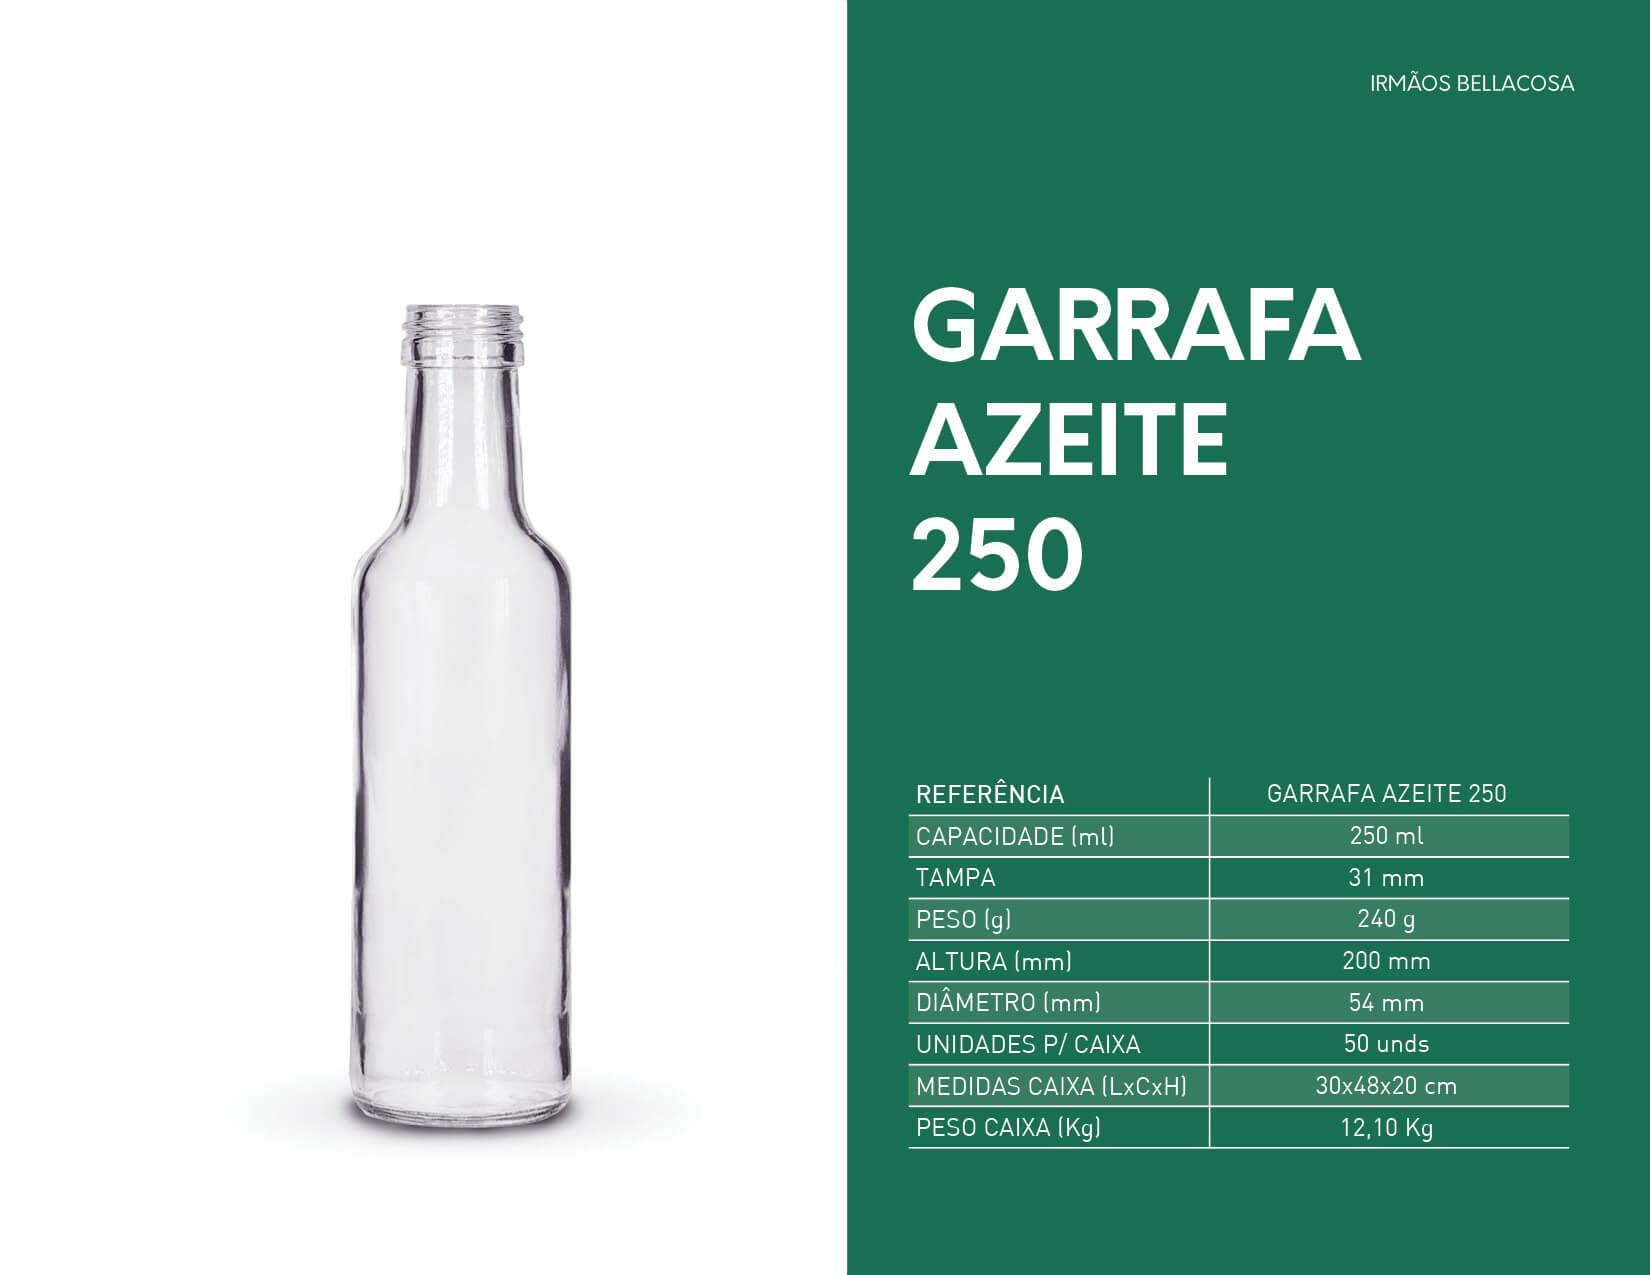 032-Garrafa-azeite-250-irmaos-bellacosa-embalagens-de-vidro